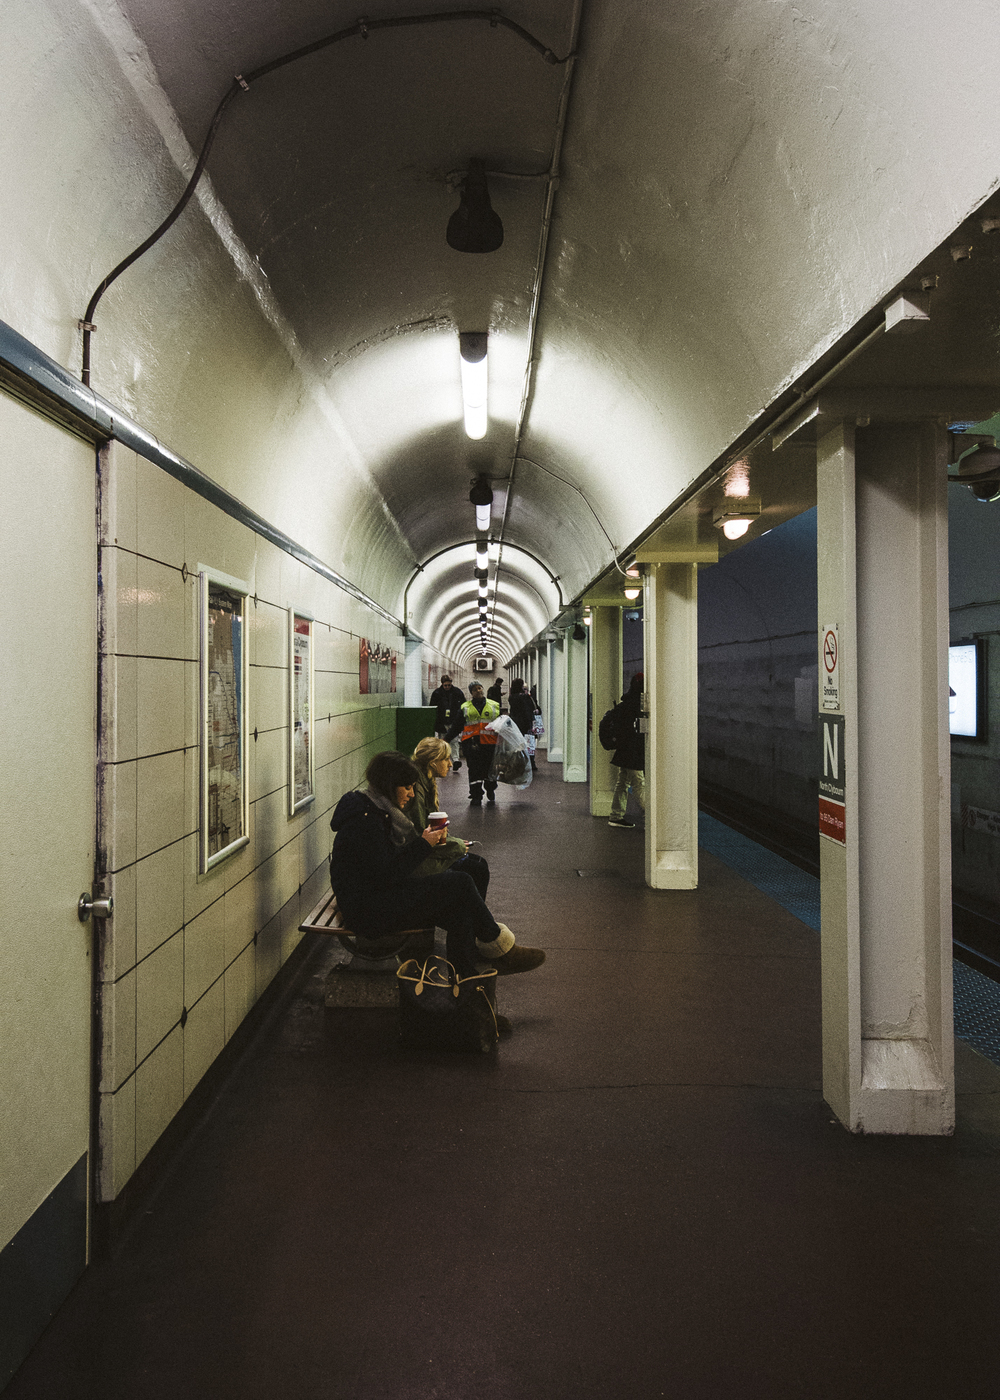 North/Clybourn Station Platform, Lincoln Park, Chicago; November 2013